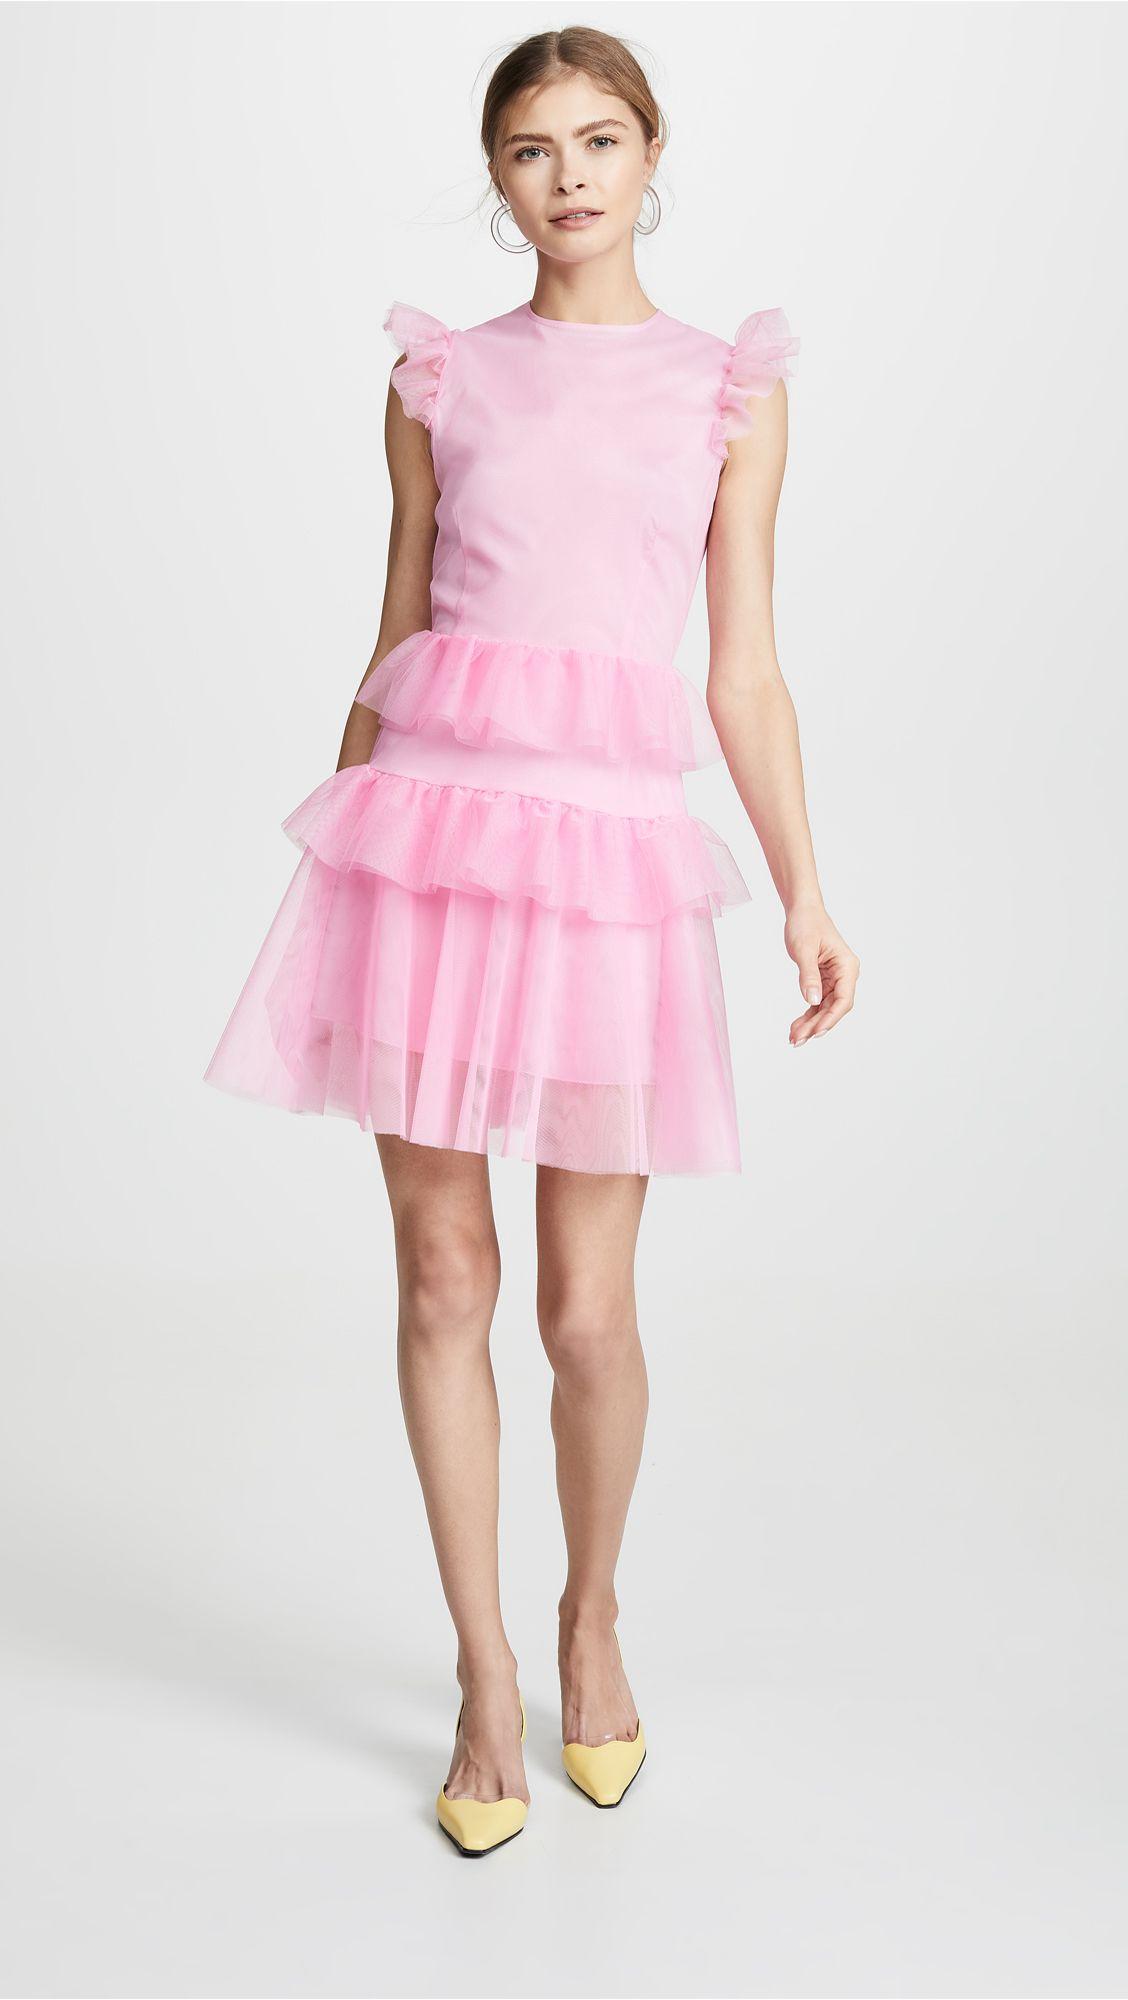 eb12cca902 Ewa Herzog - Tiered Mini Dress | Stylish Cocktail Dresses For Every ...